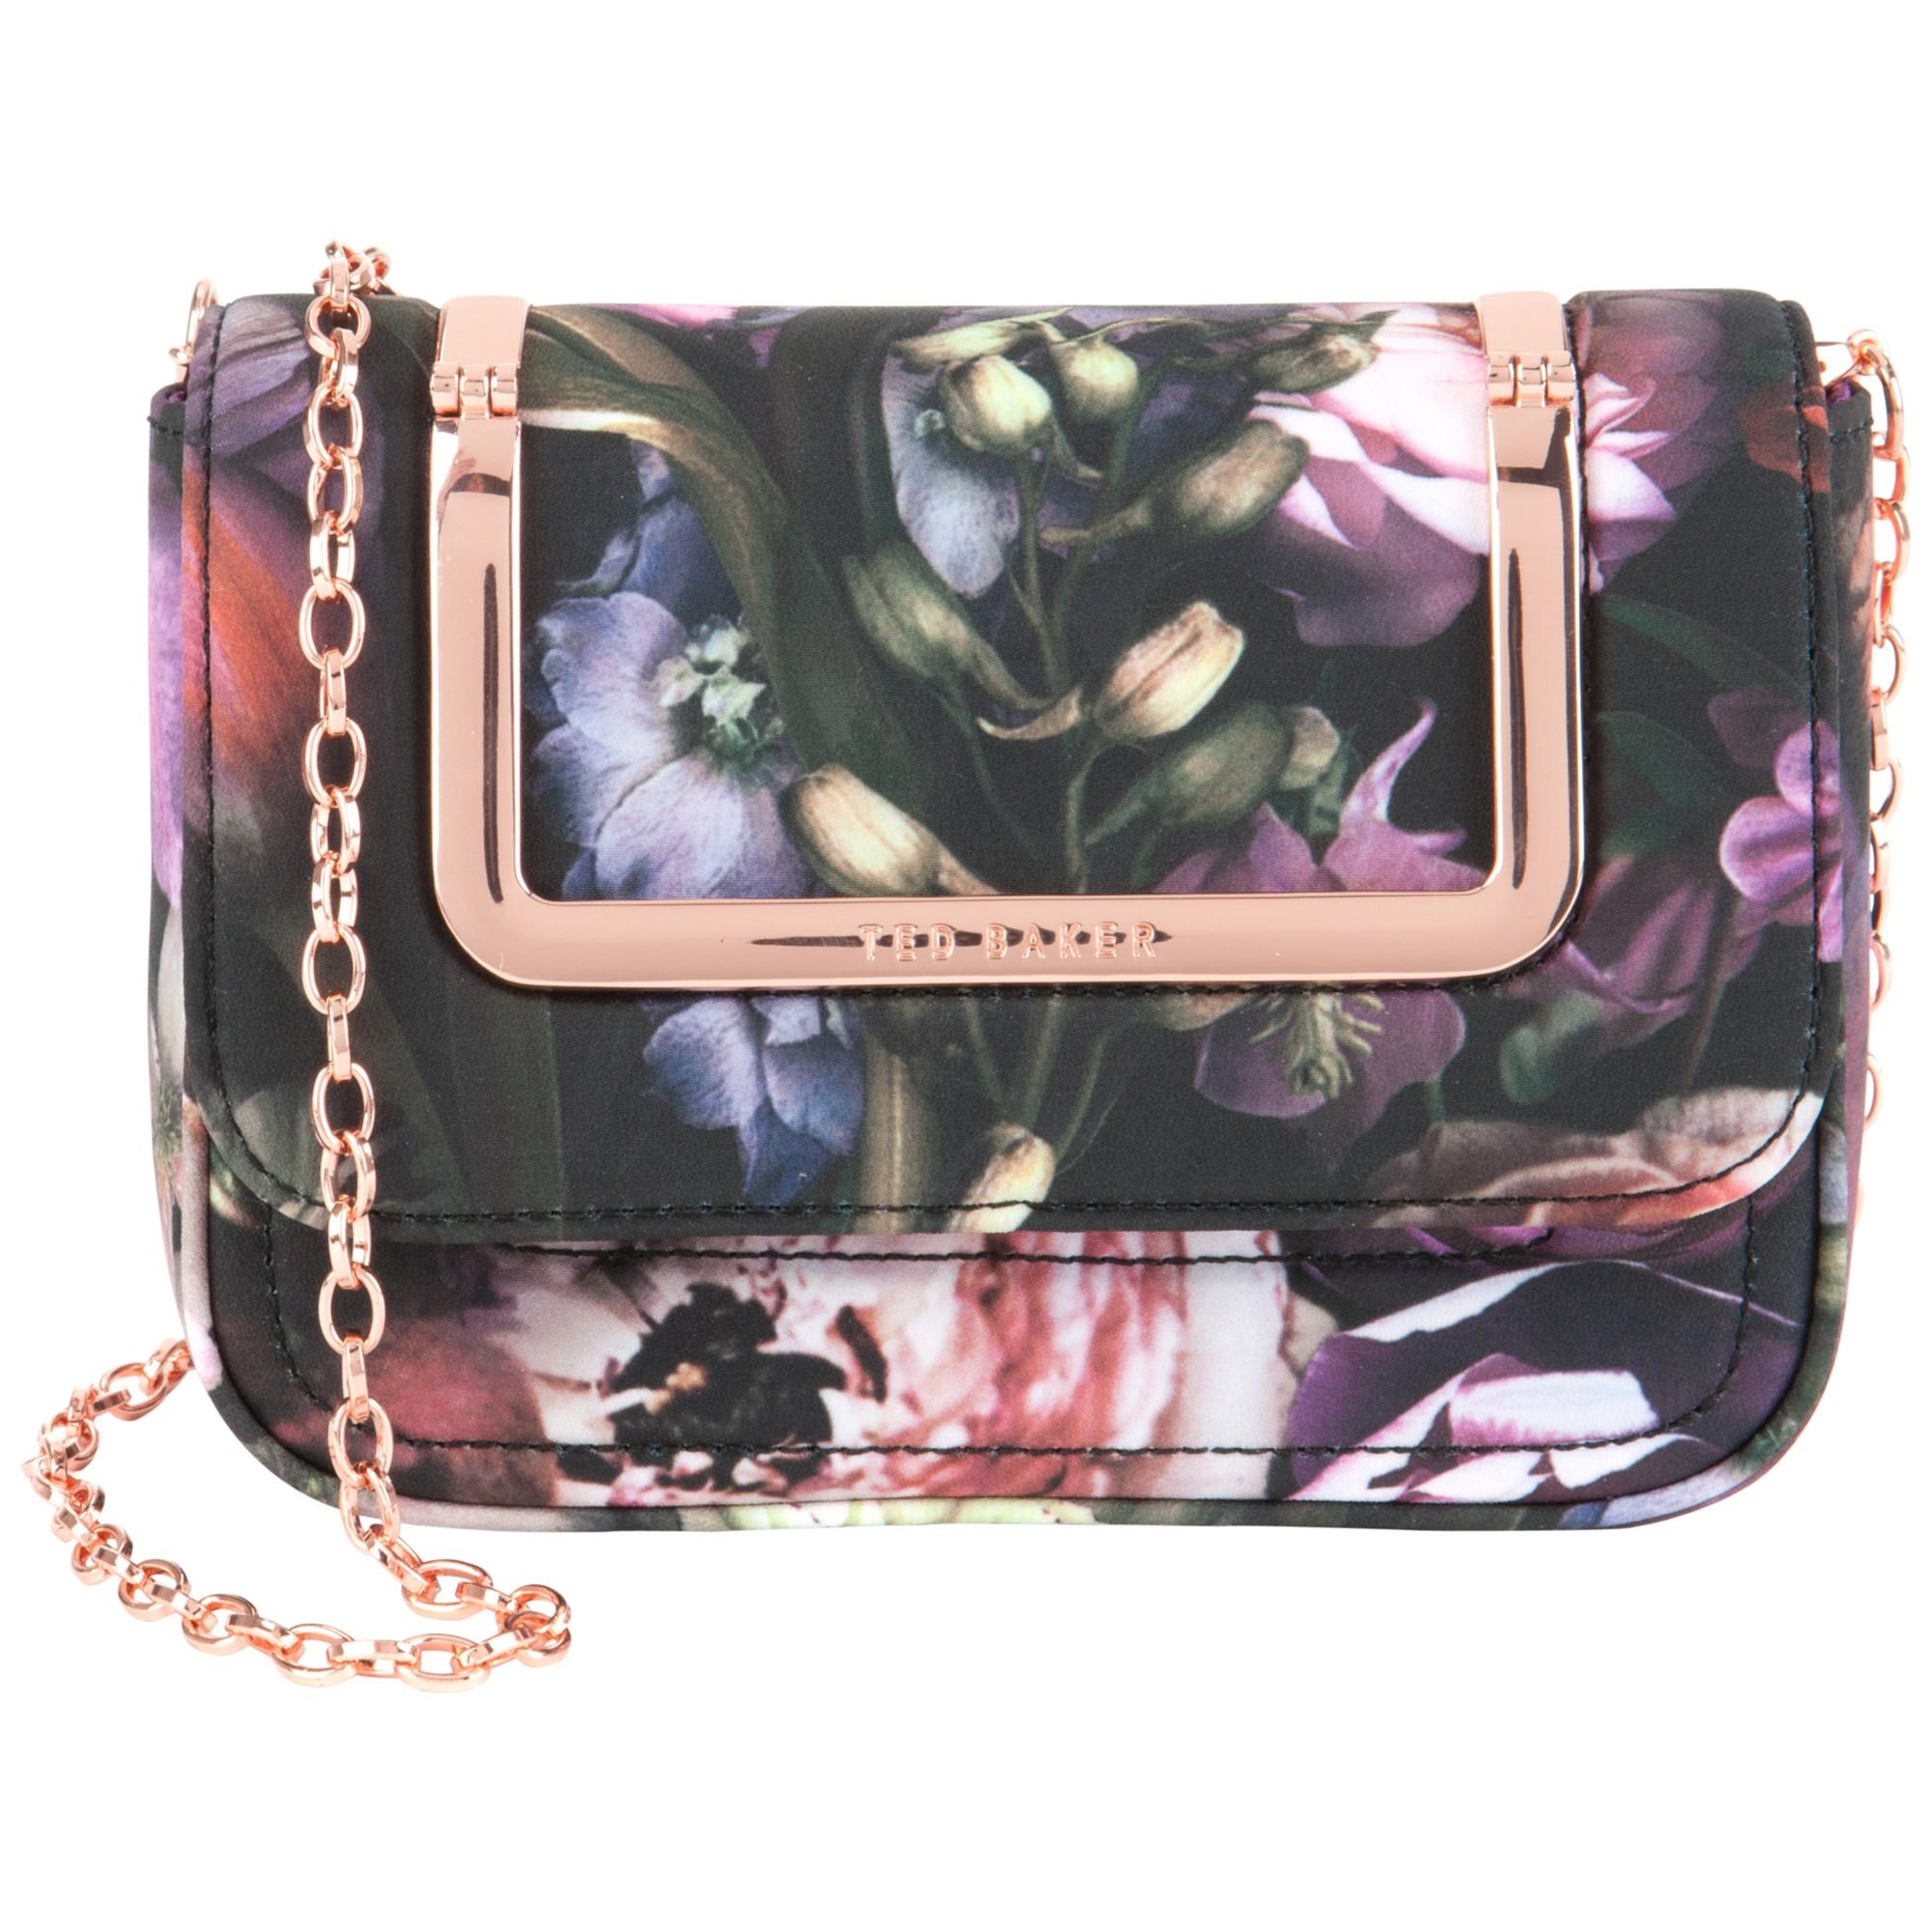 b91806eca46 Ted Baker Sefina Shadow Floral Clutch Bag in Gray - Lyst